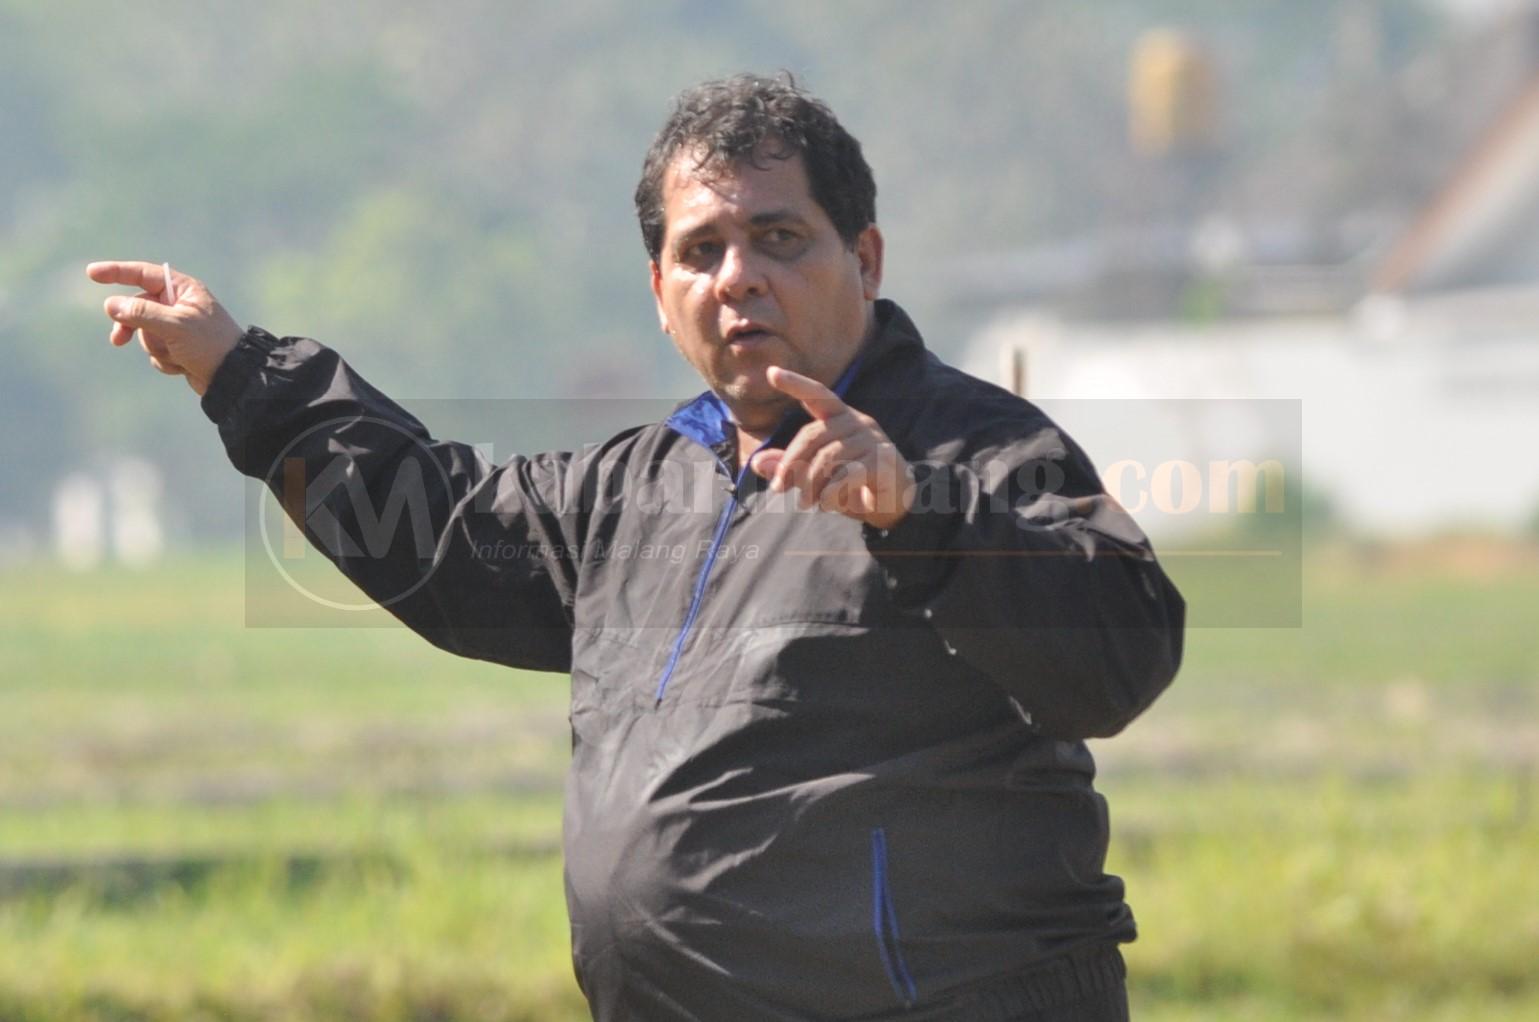 Pelatih Arema Frustasi Kalau Liga Ditunda Lagi